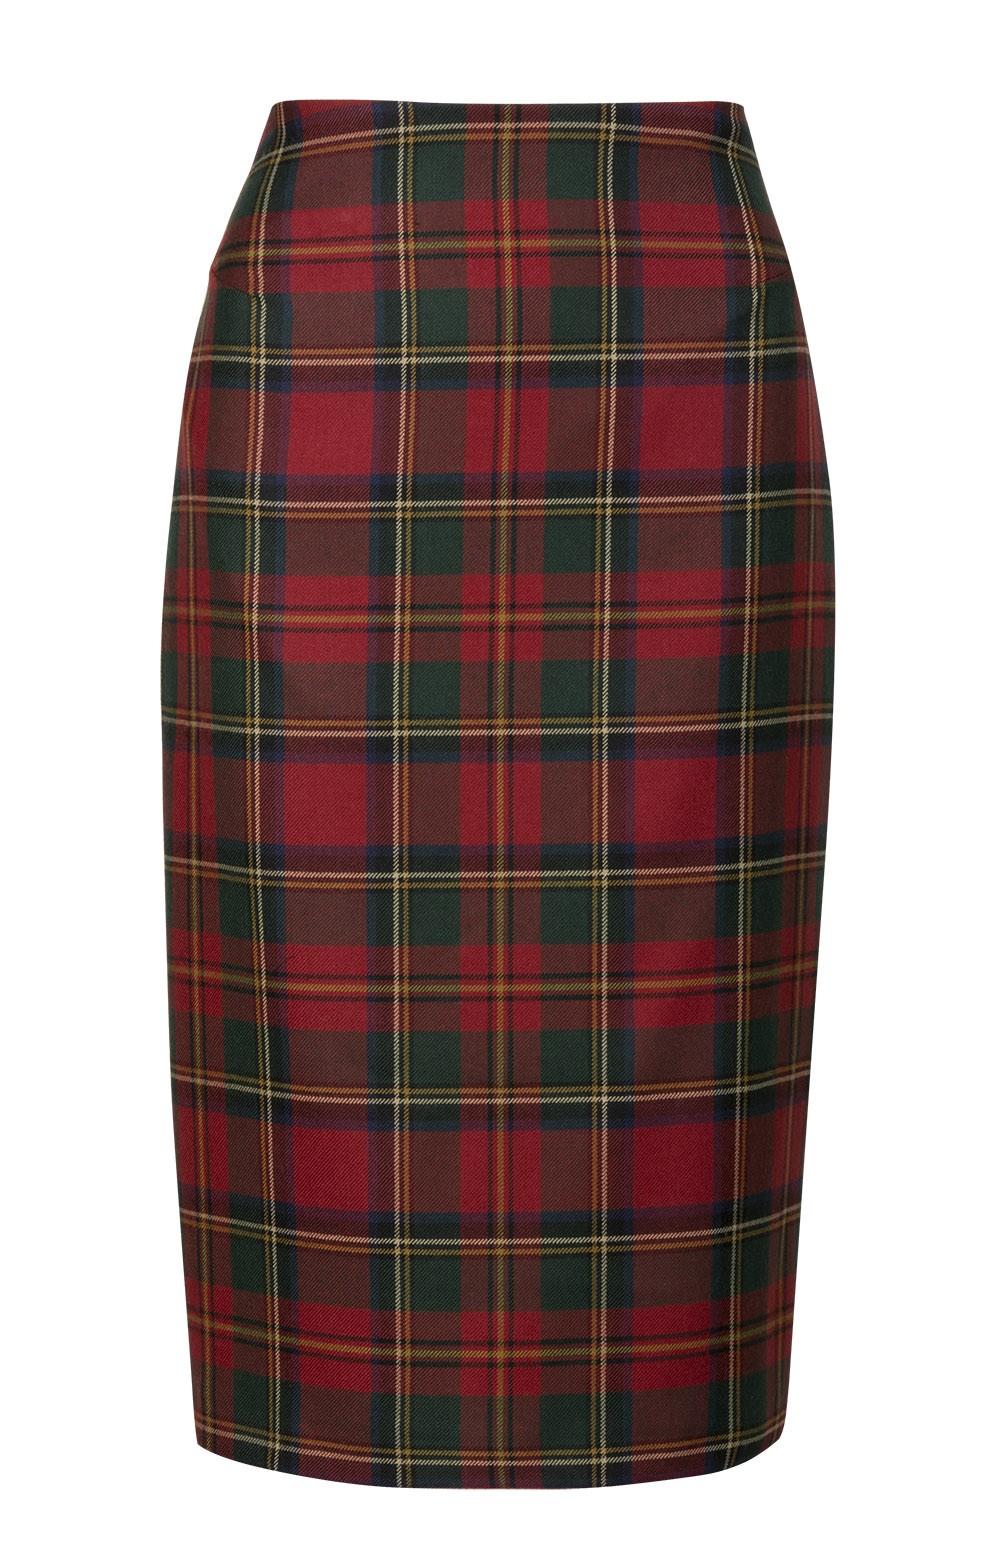 296ecb9b1c20 Plaid Pencil Skirt - House of Bruar